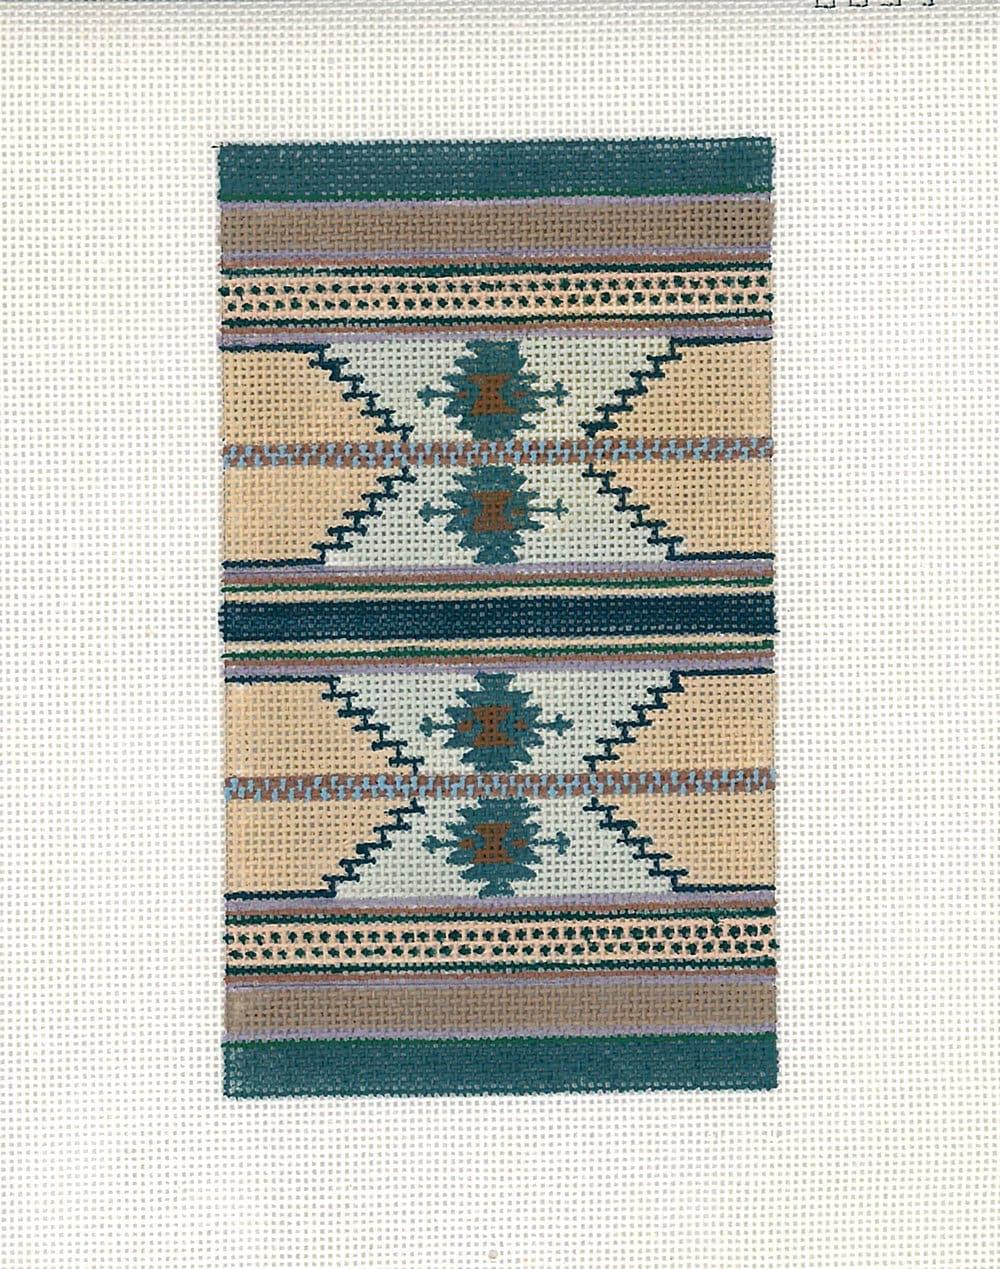 Indian blanket aida cloth designer native american indian etsy zoom solutioingenieria Gallery